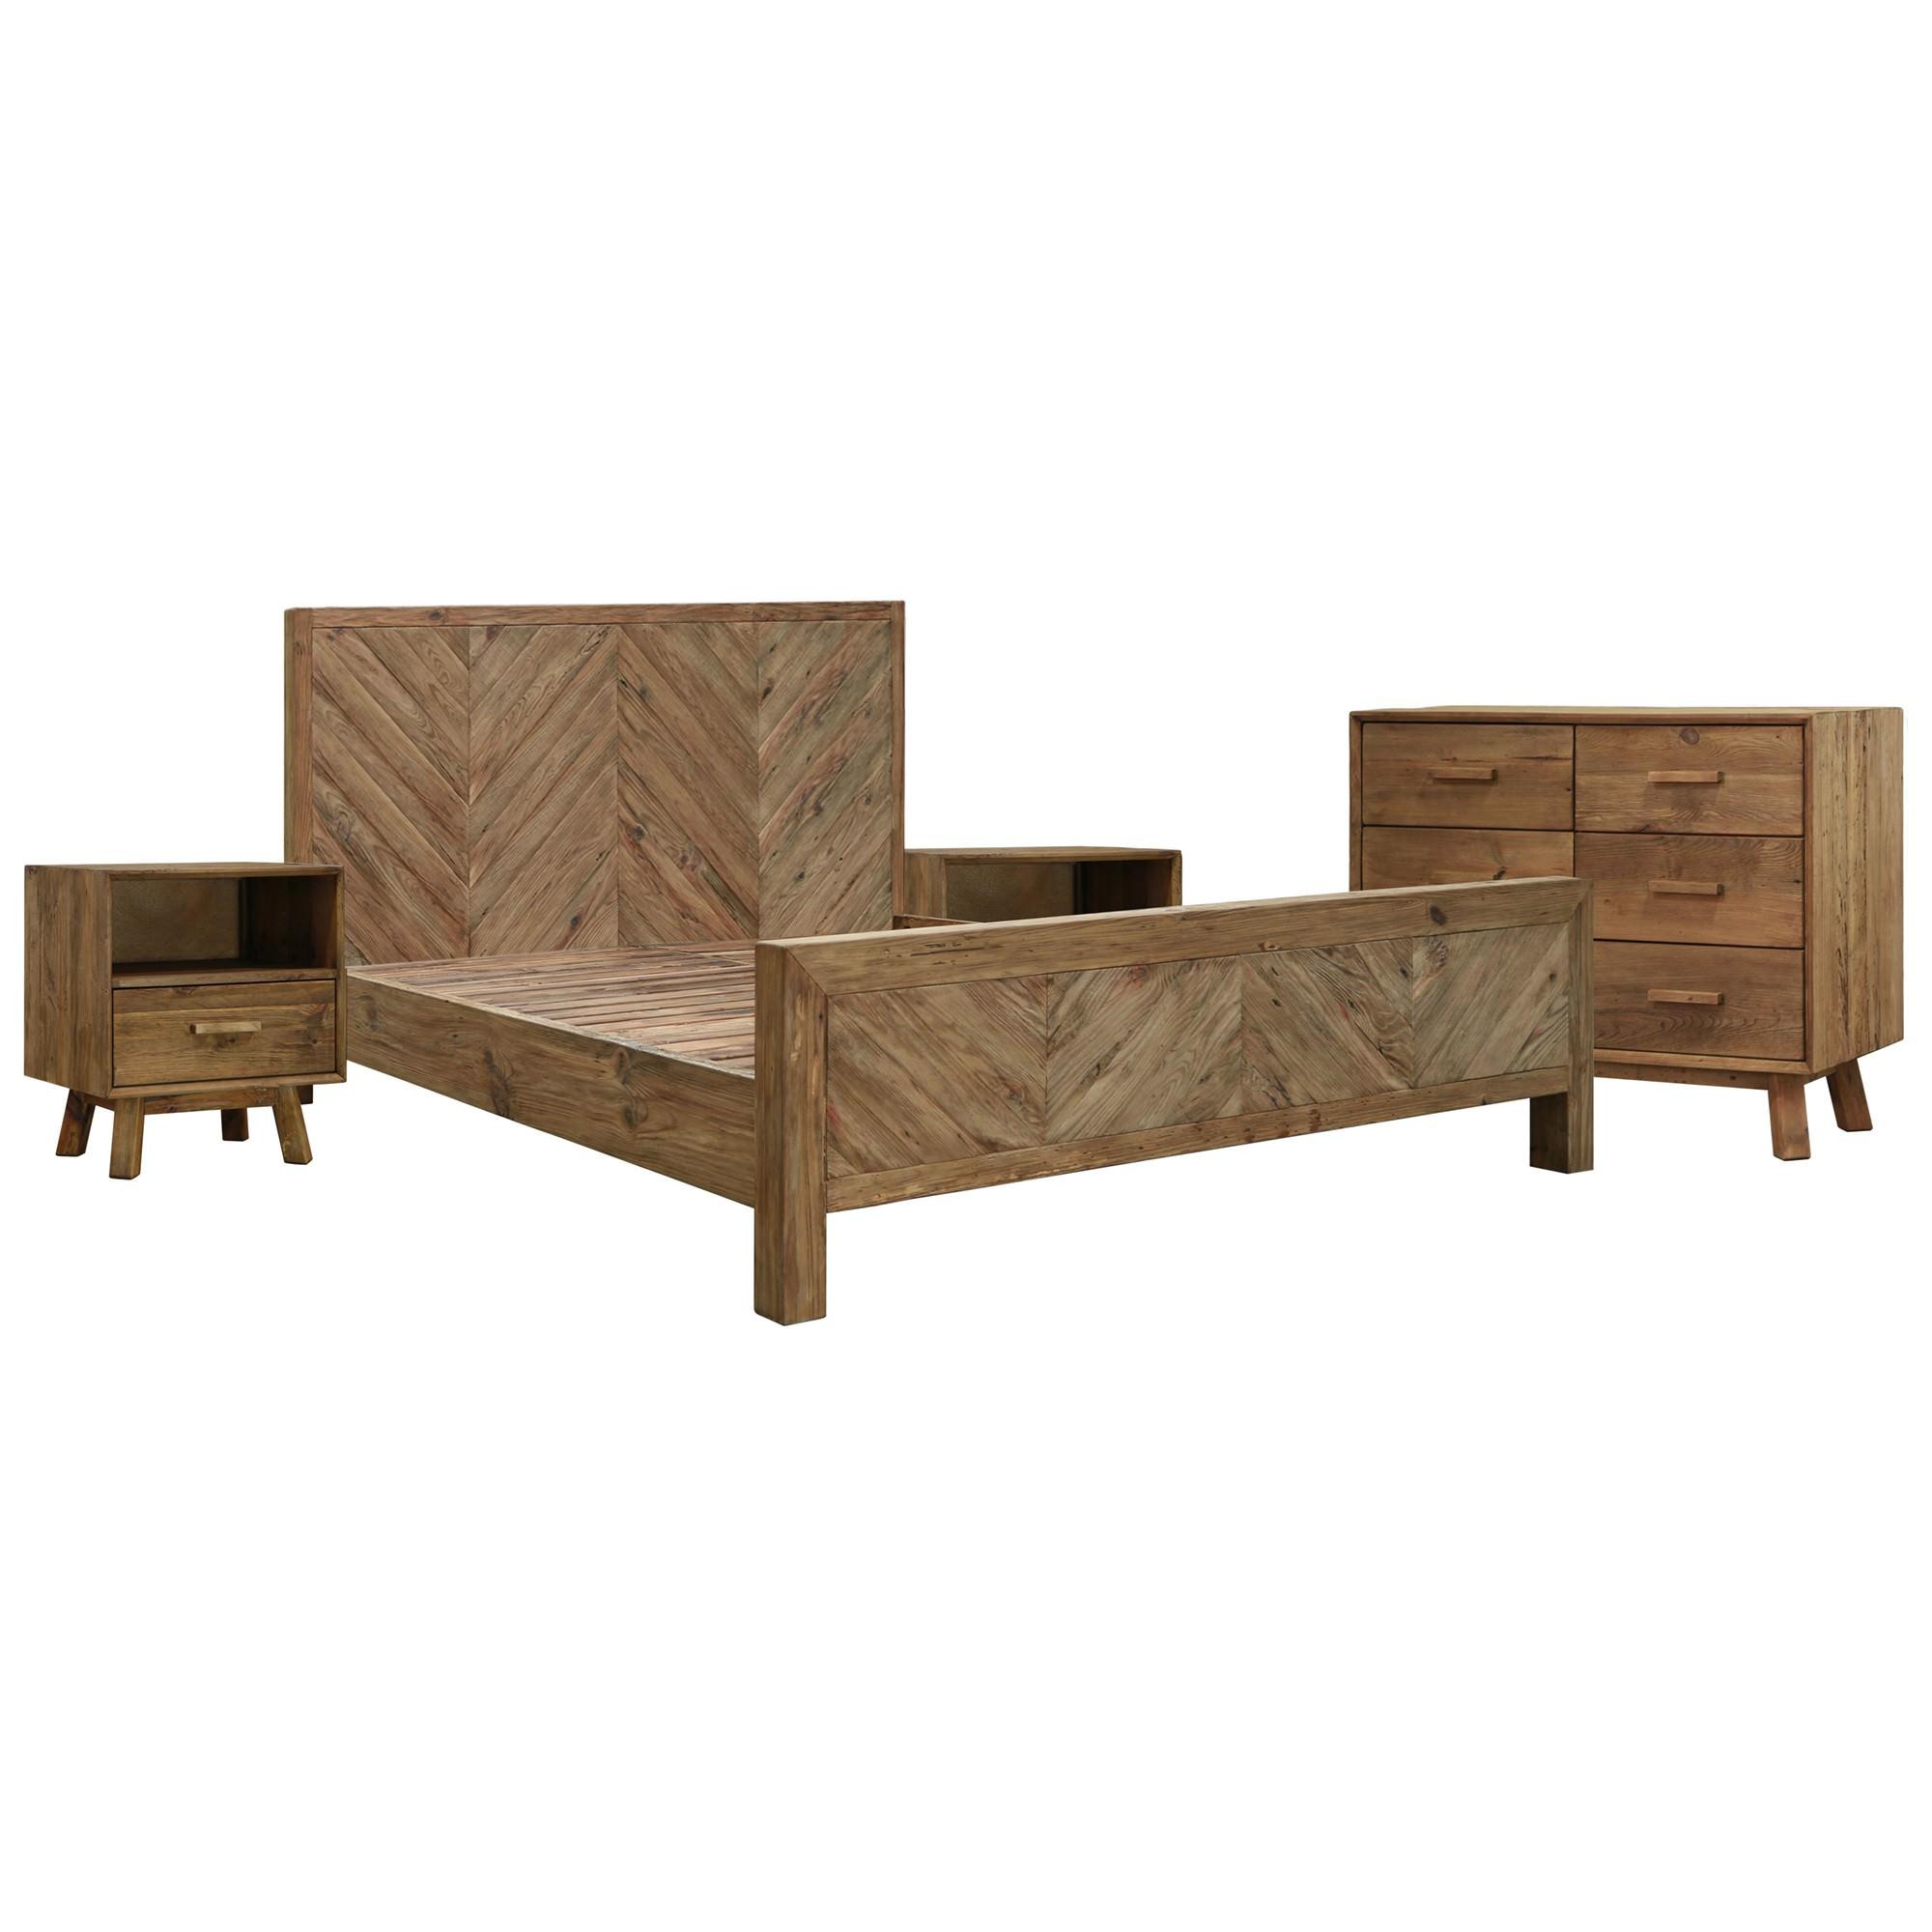 Mandalay Recycled Pine Timber 4 Piece Bedroom Dresser Suite, Queen